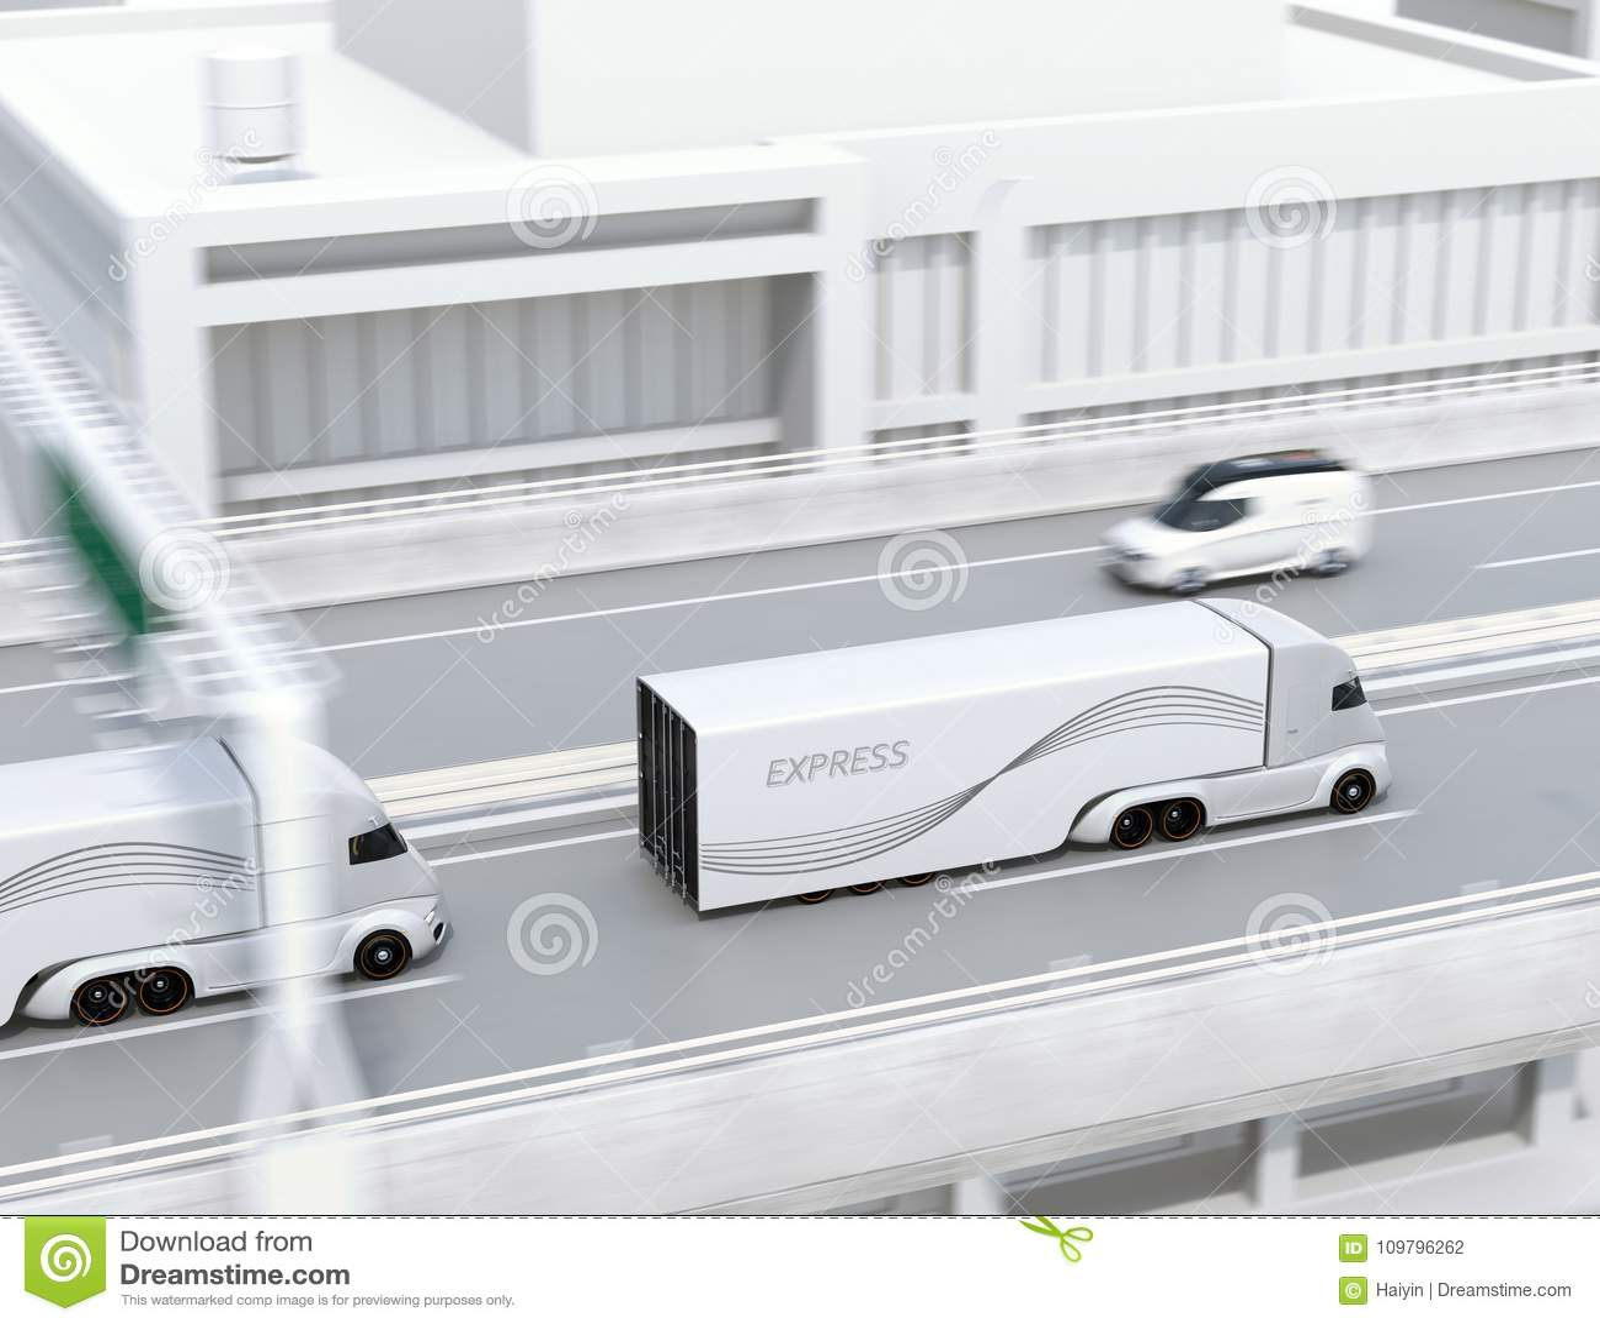 A fleet of self-driving electric semi trucks driving on highway